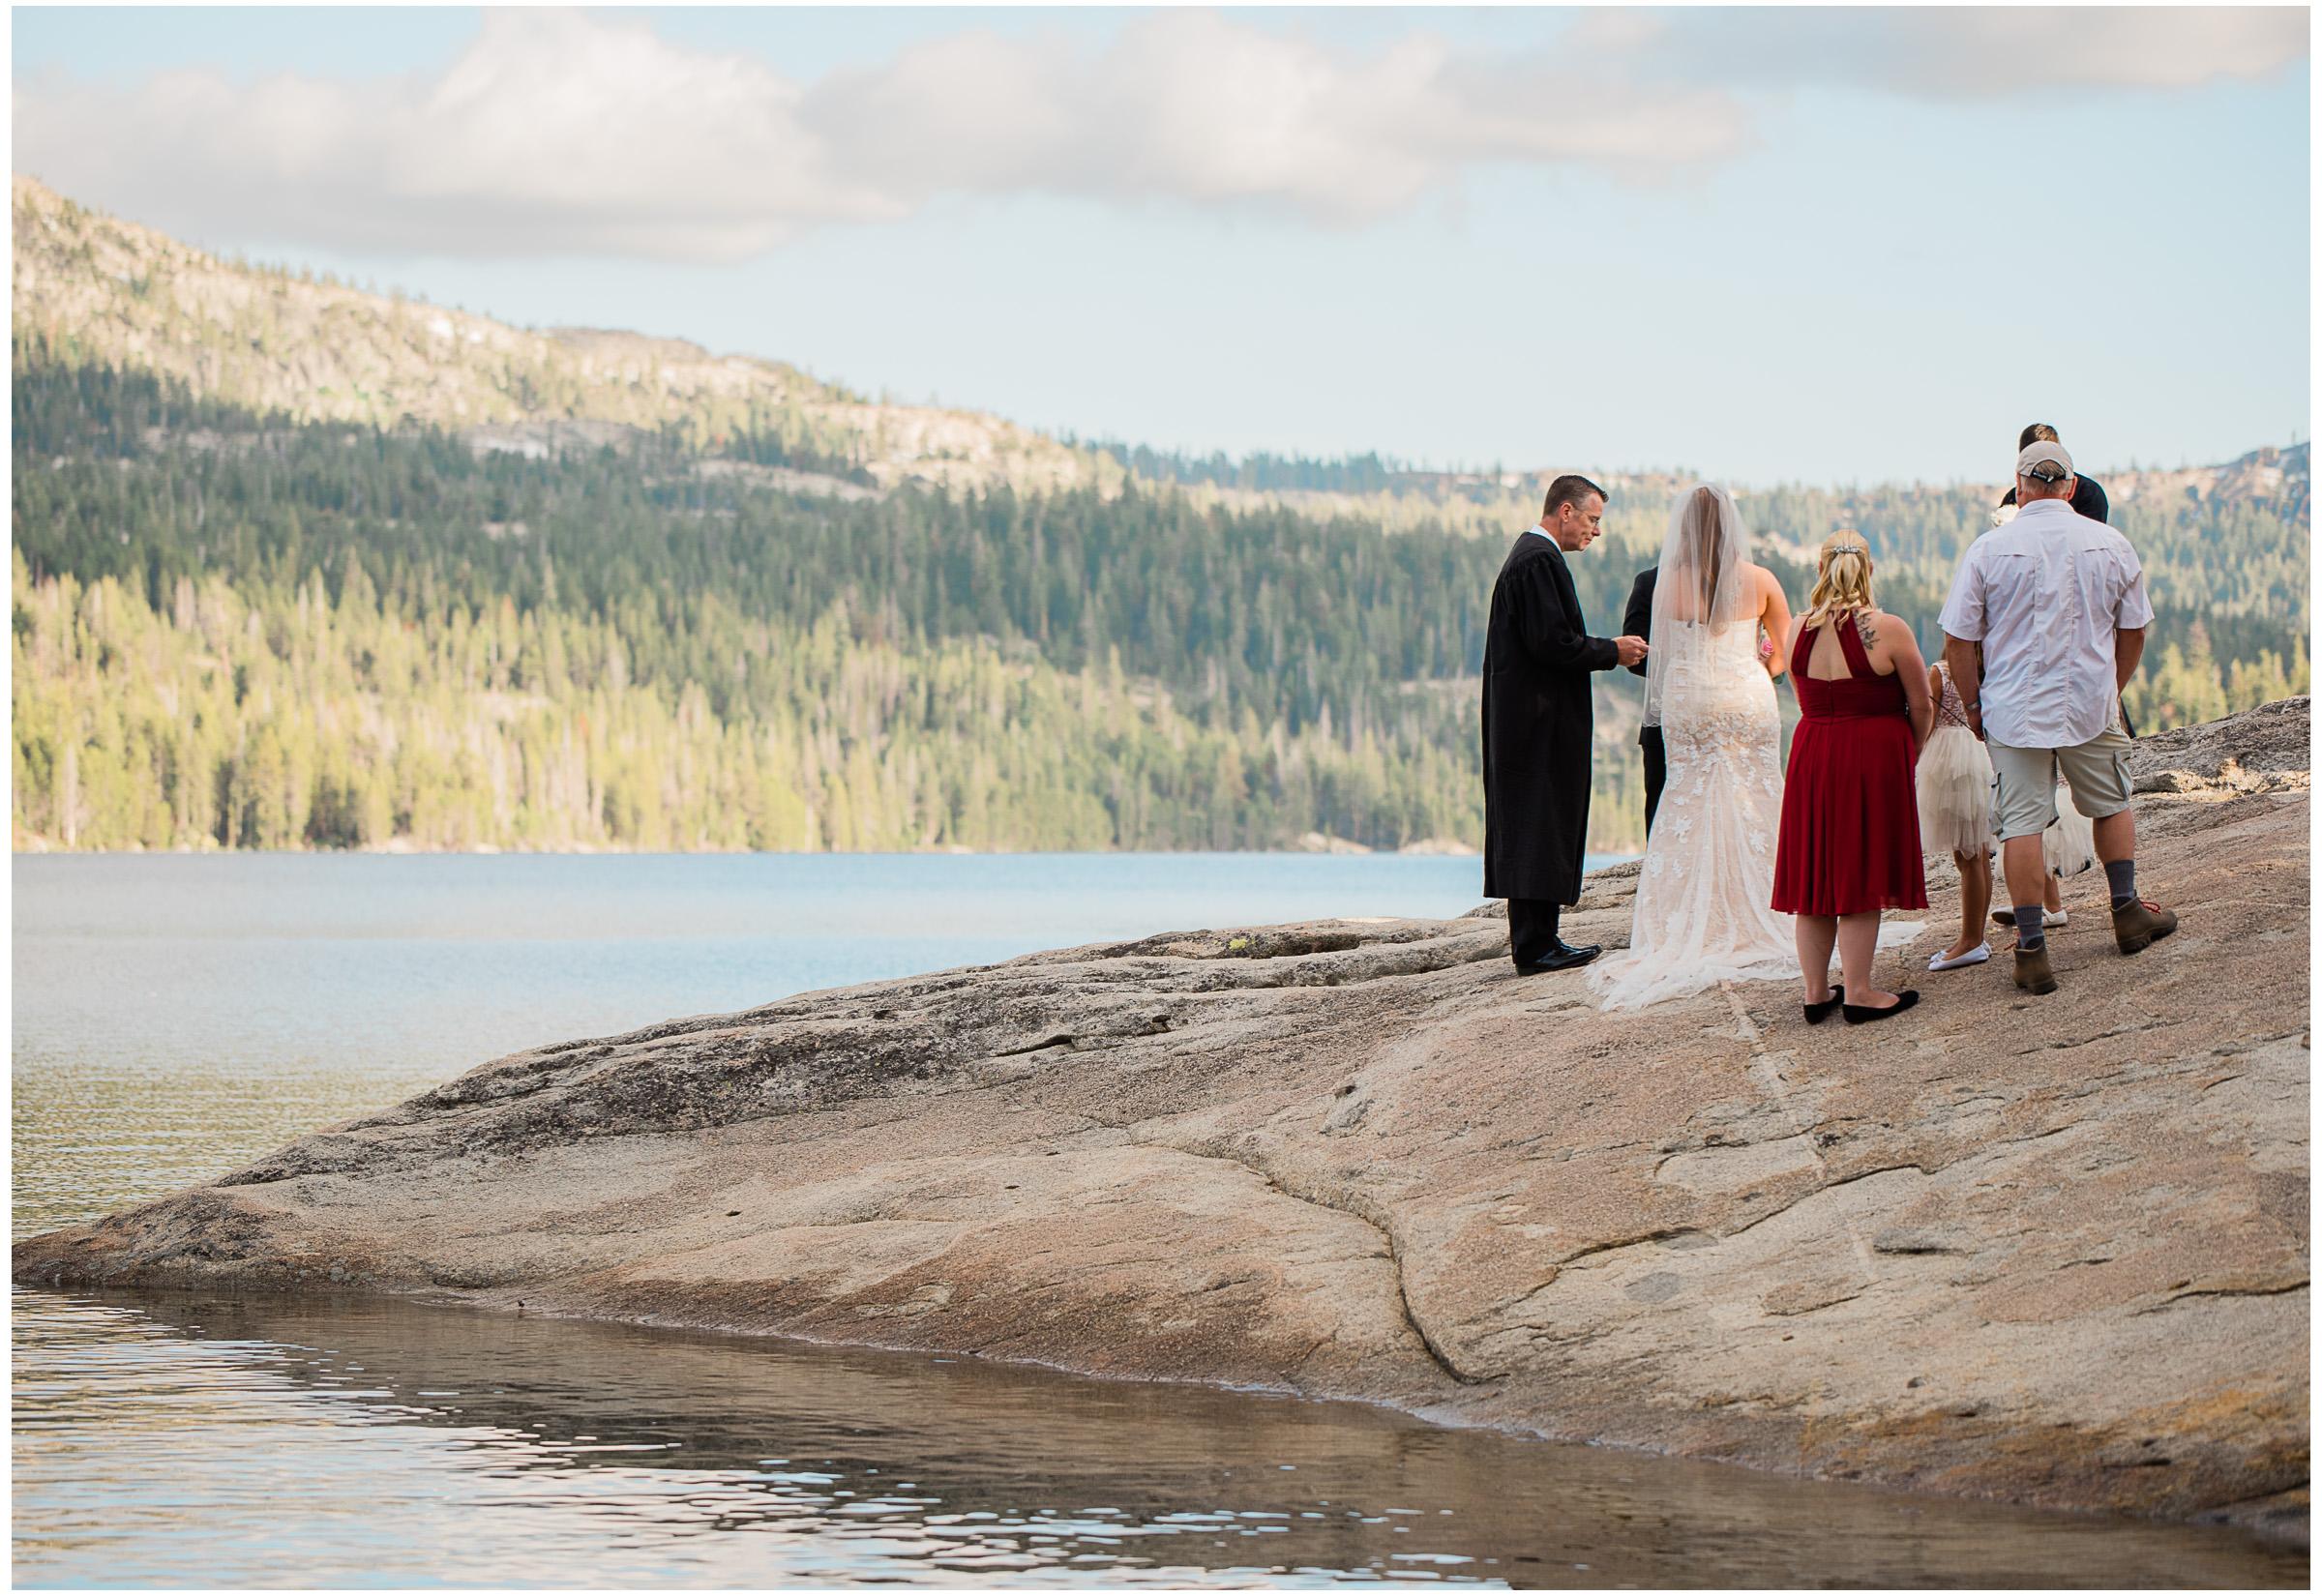 Clarksburg Wedding - Sacramento Photographer - Bogle Winery - Justin Wilcox Photography - 7.jpg